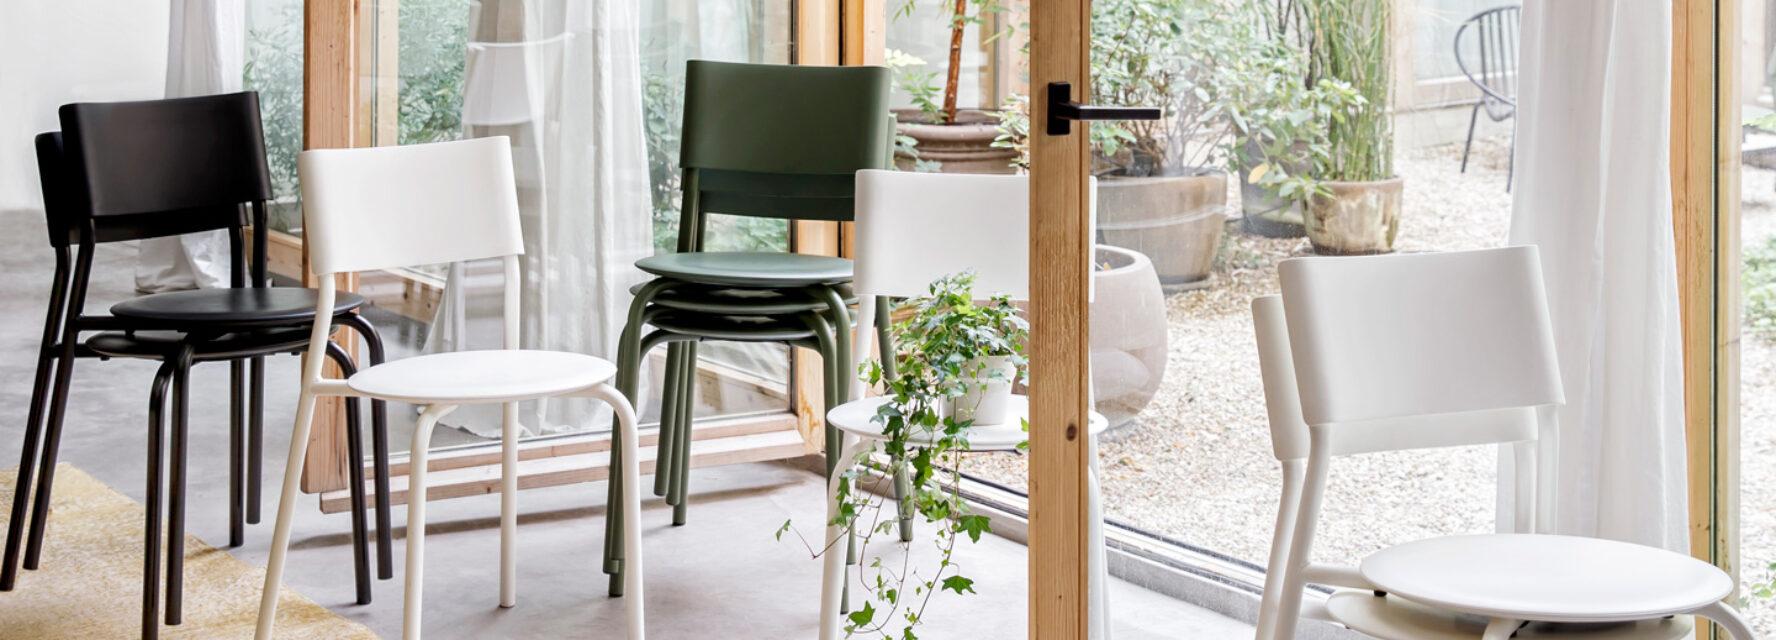 Chairs - TIPTOE